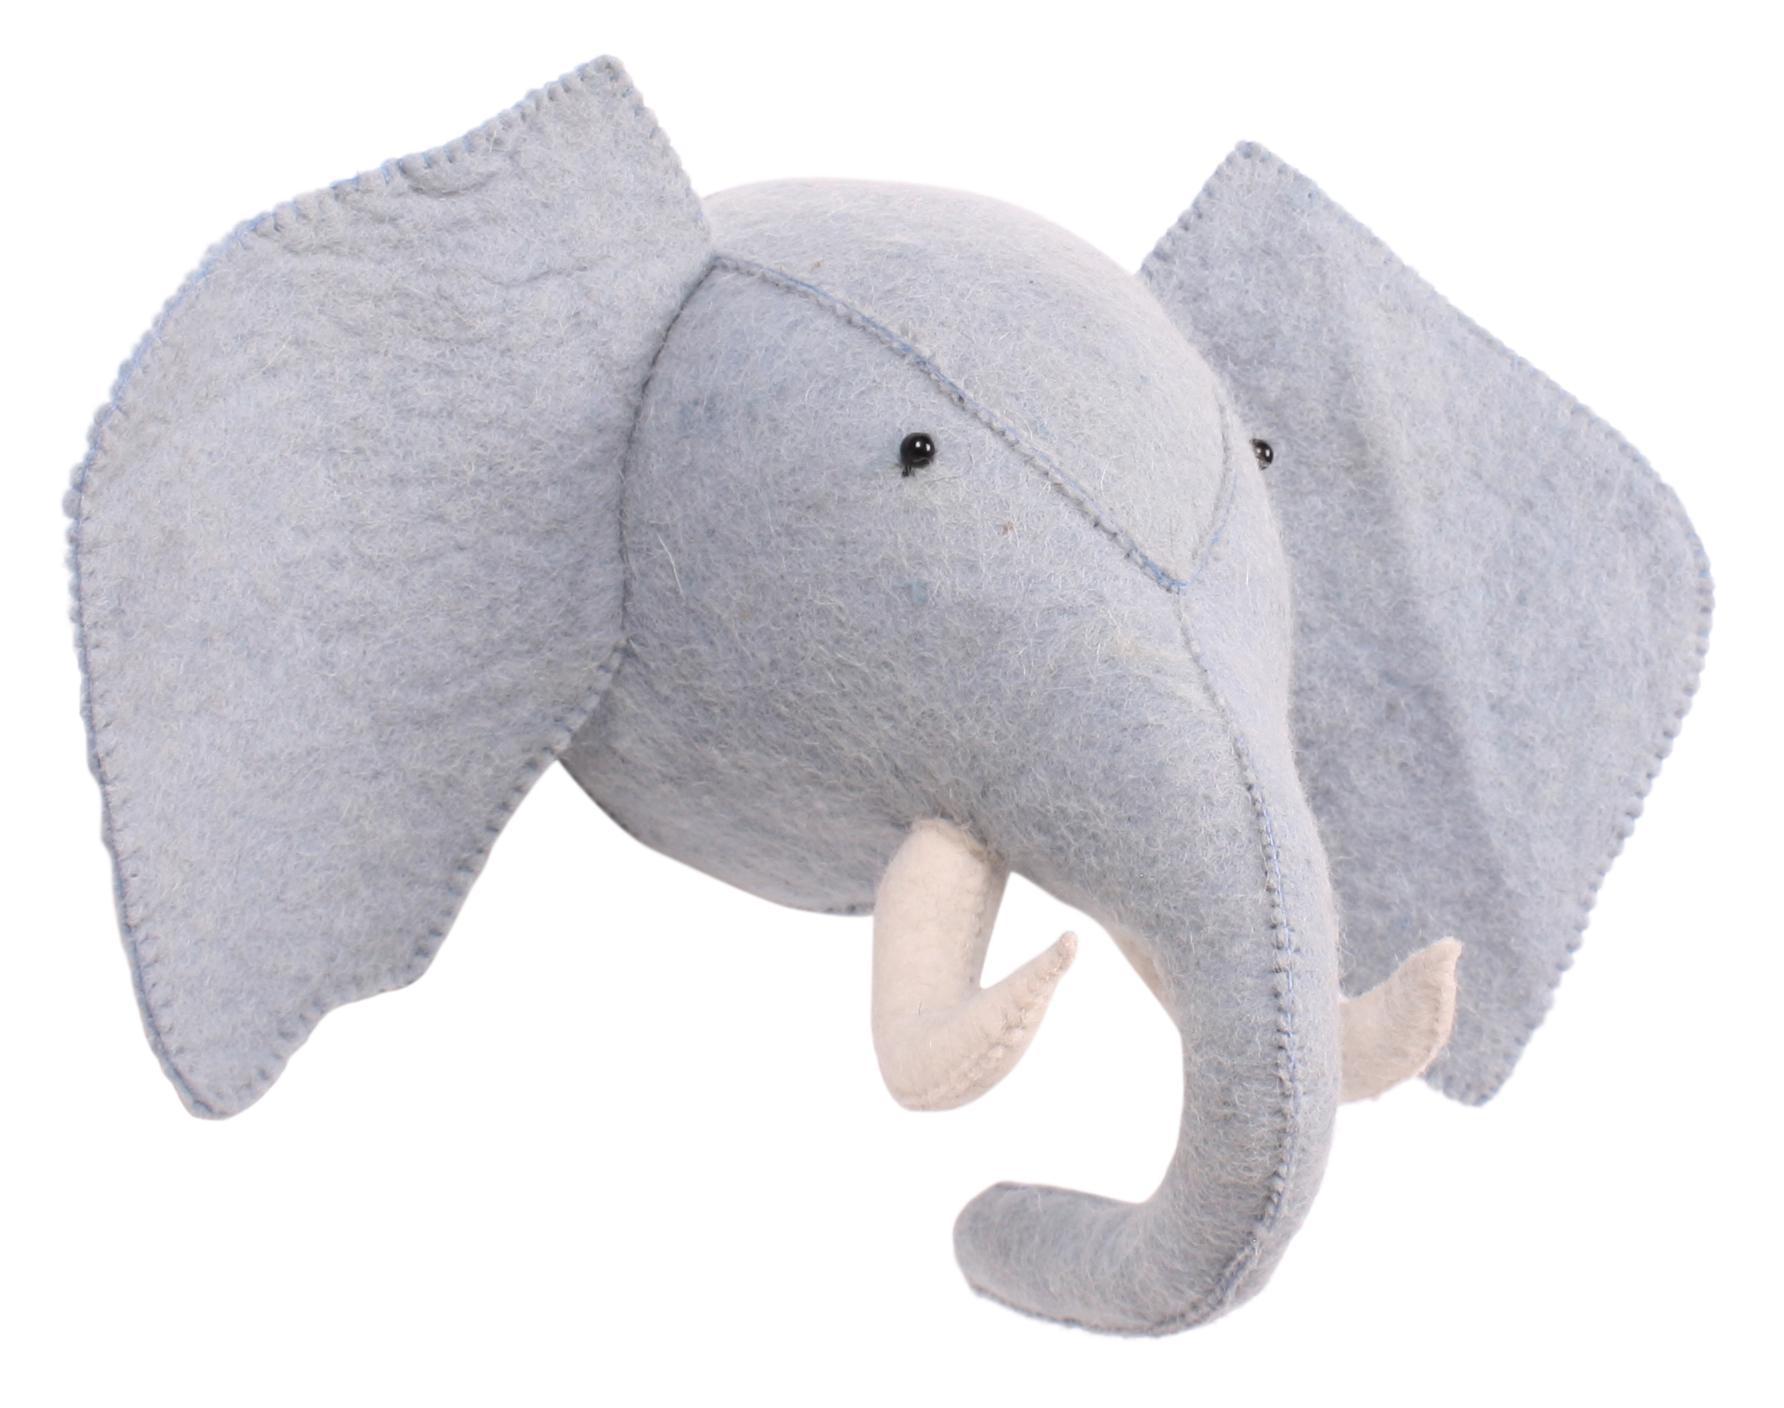 Kidsdepot filz wand dekoration elefant blau for Filz dekoration